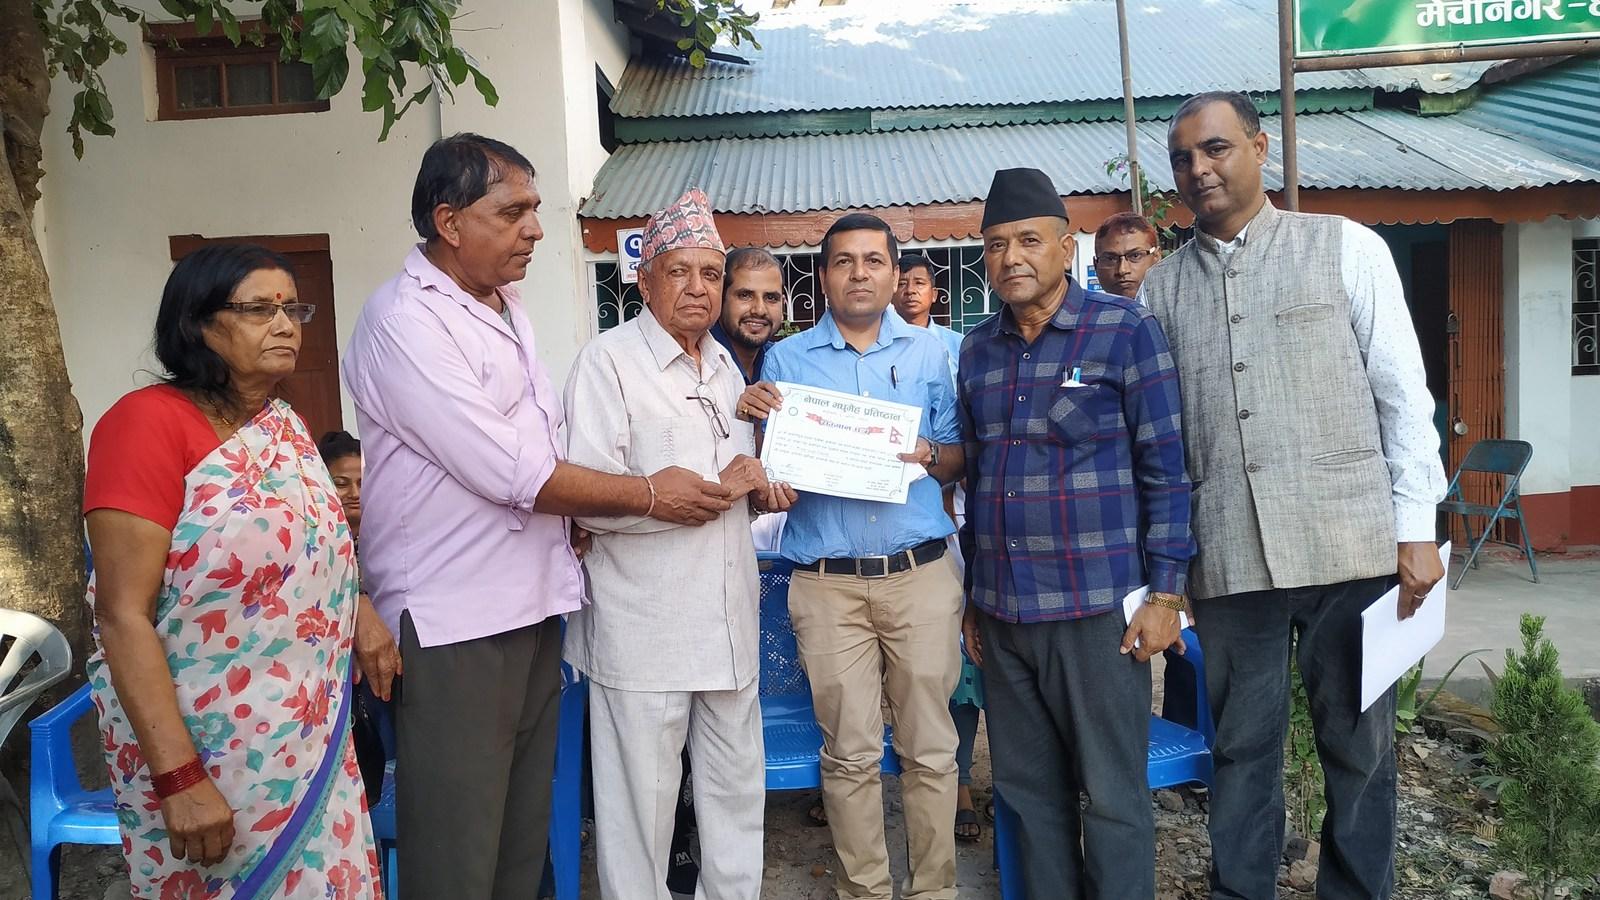 Diabetes Eye Screening Health Camp On 29th World Diabetes Day Rotary Club Of Kakarvitta 2